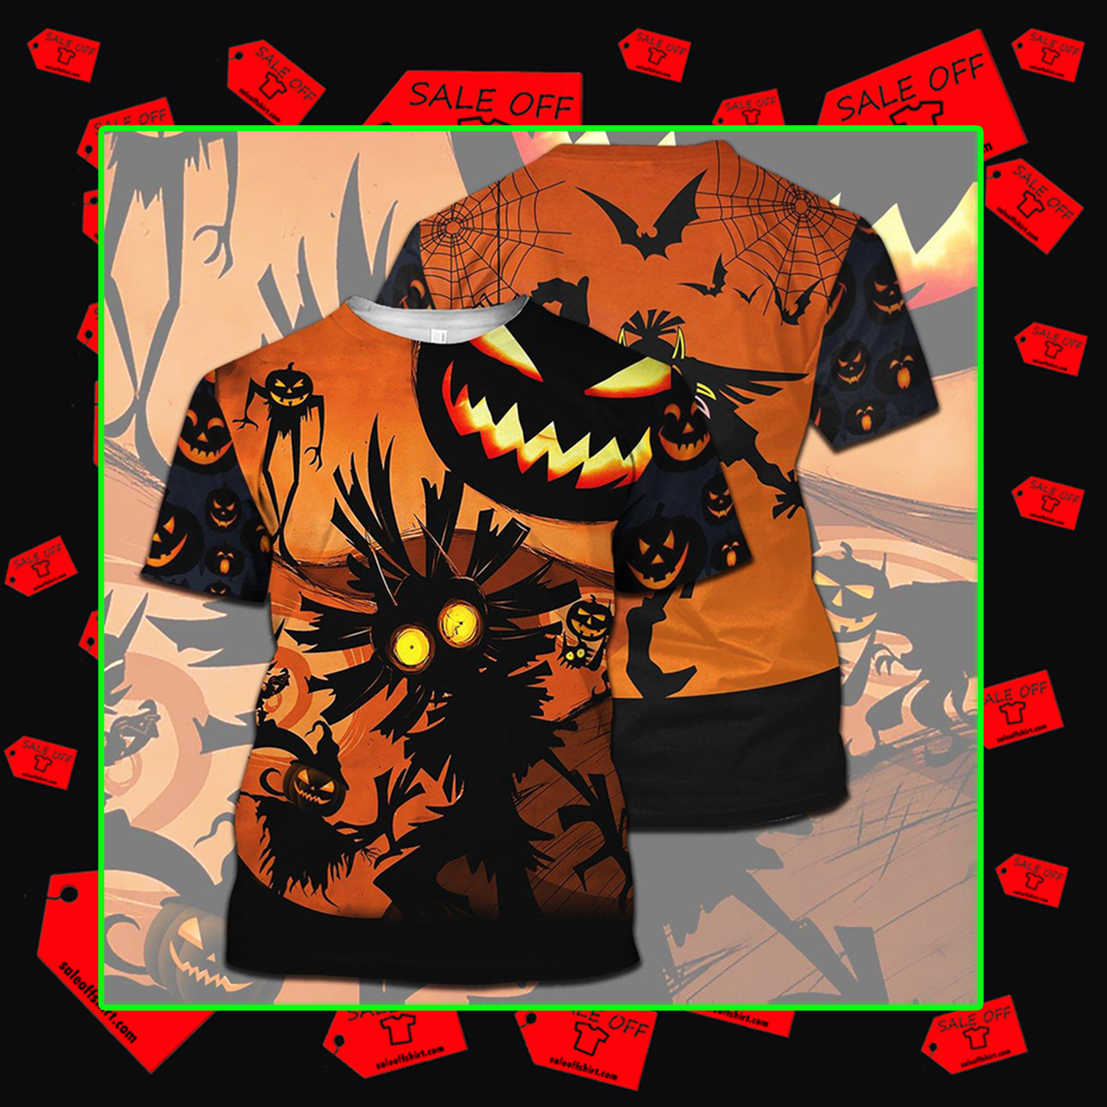 Skull Kid Halloween 3d t-shirt